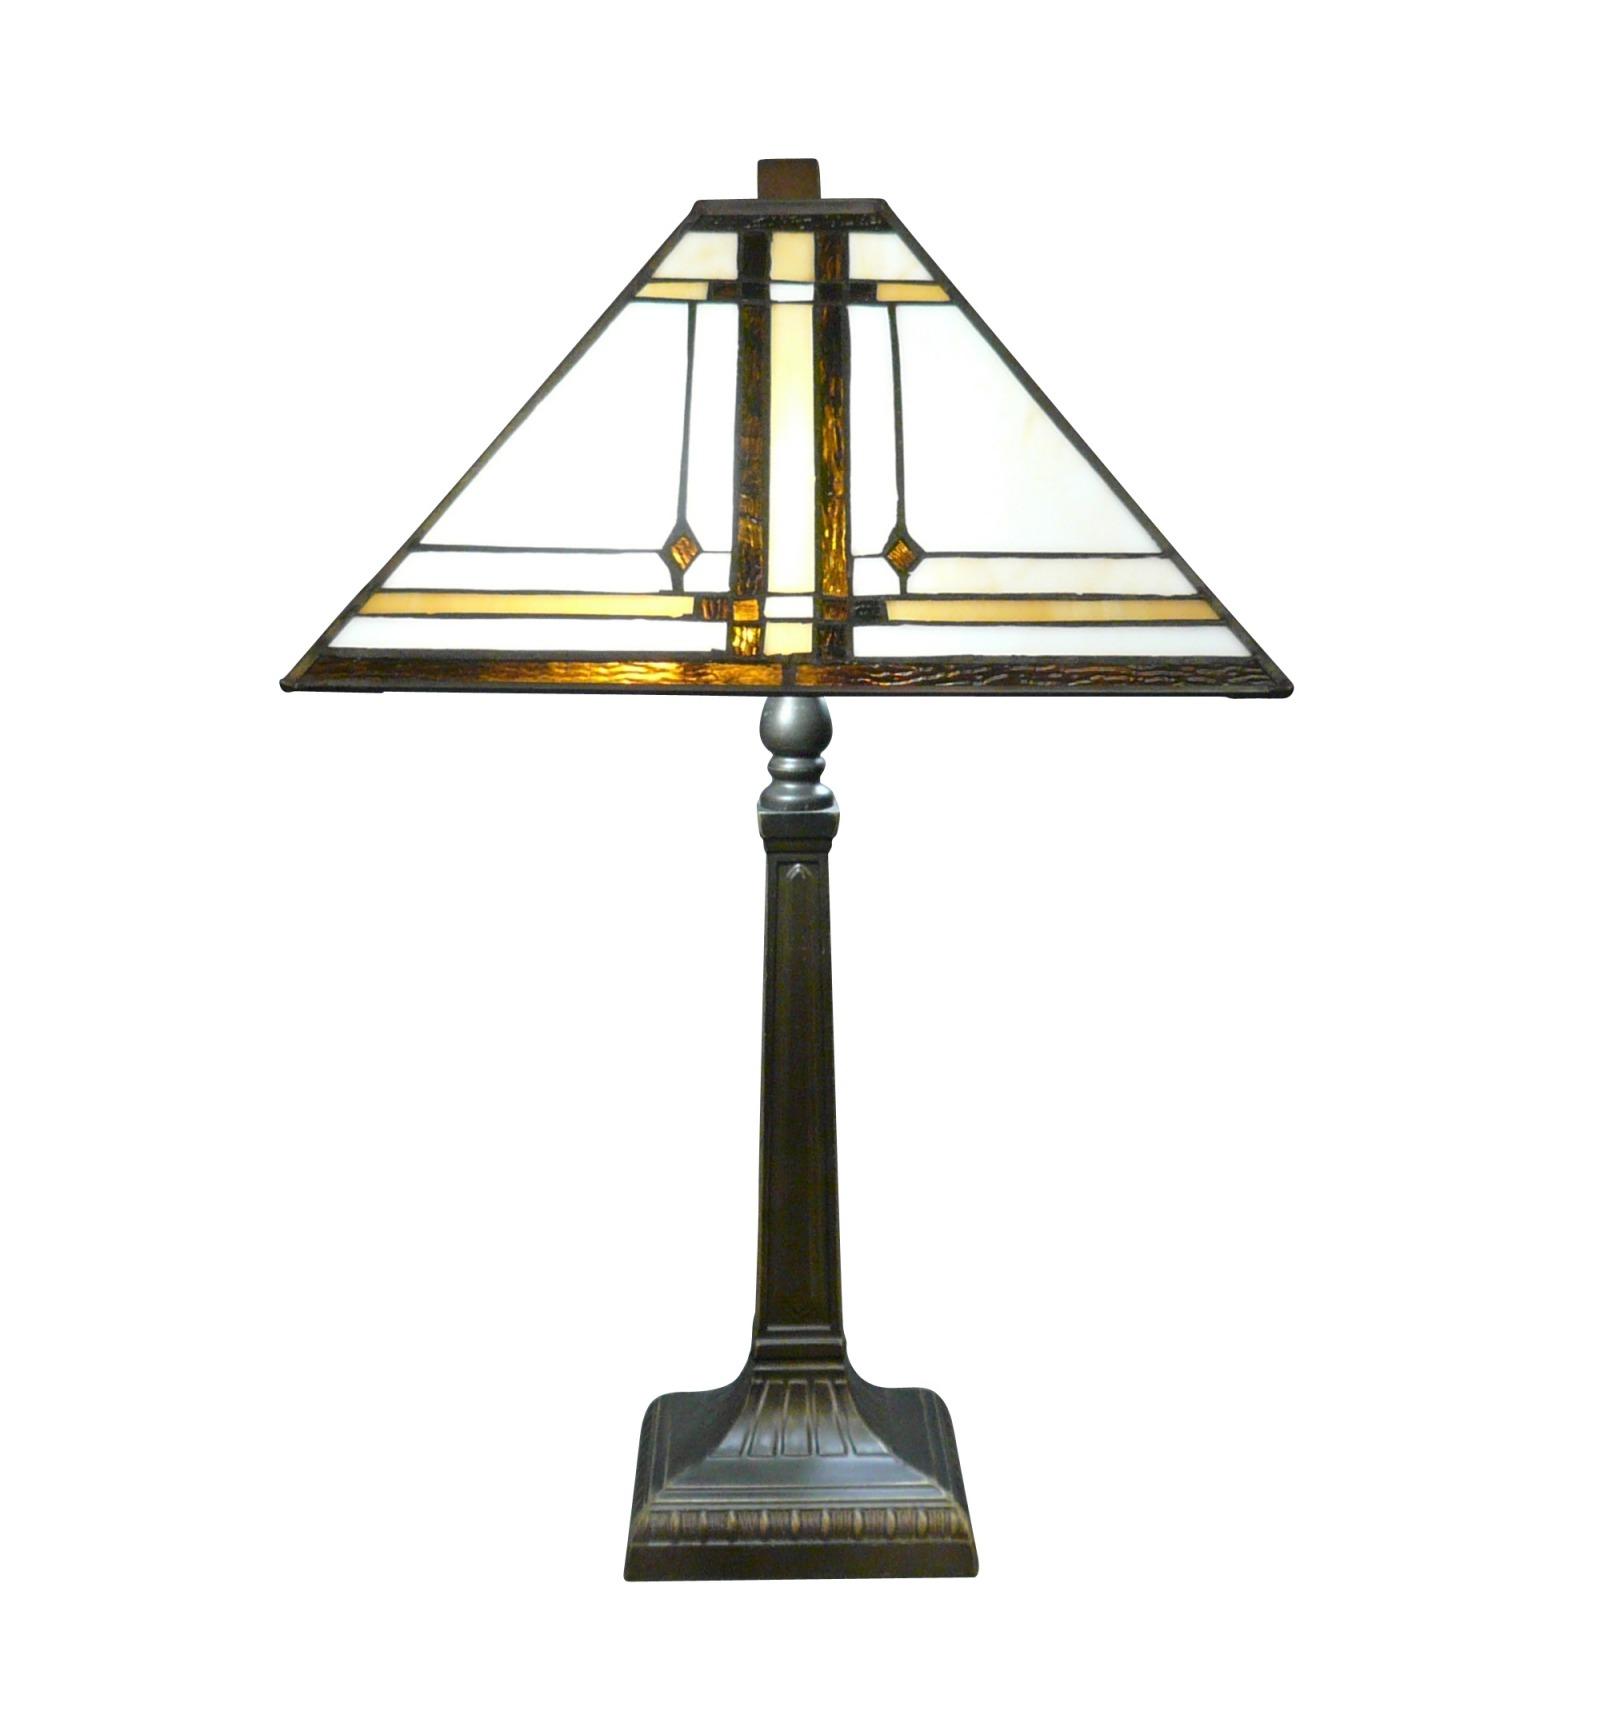 Tiffany Art Deco Lampe - Kunst Lampen und Dekoration